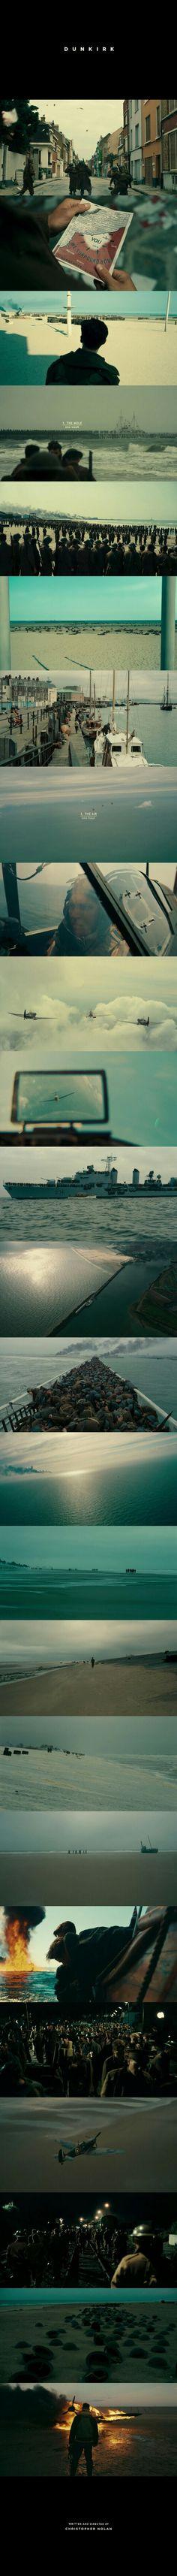 Dunkirk (2017) Director: Christopher Nolan Cinematographer: Hoyte van Hoytema